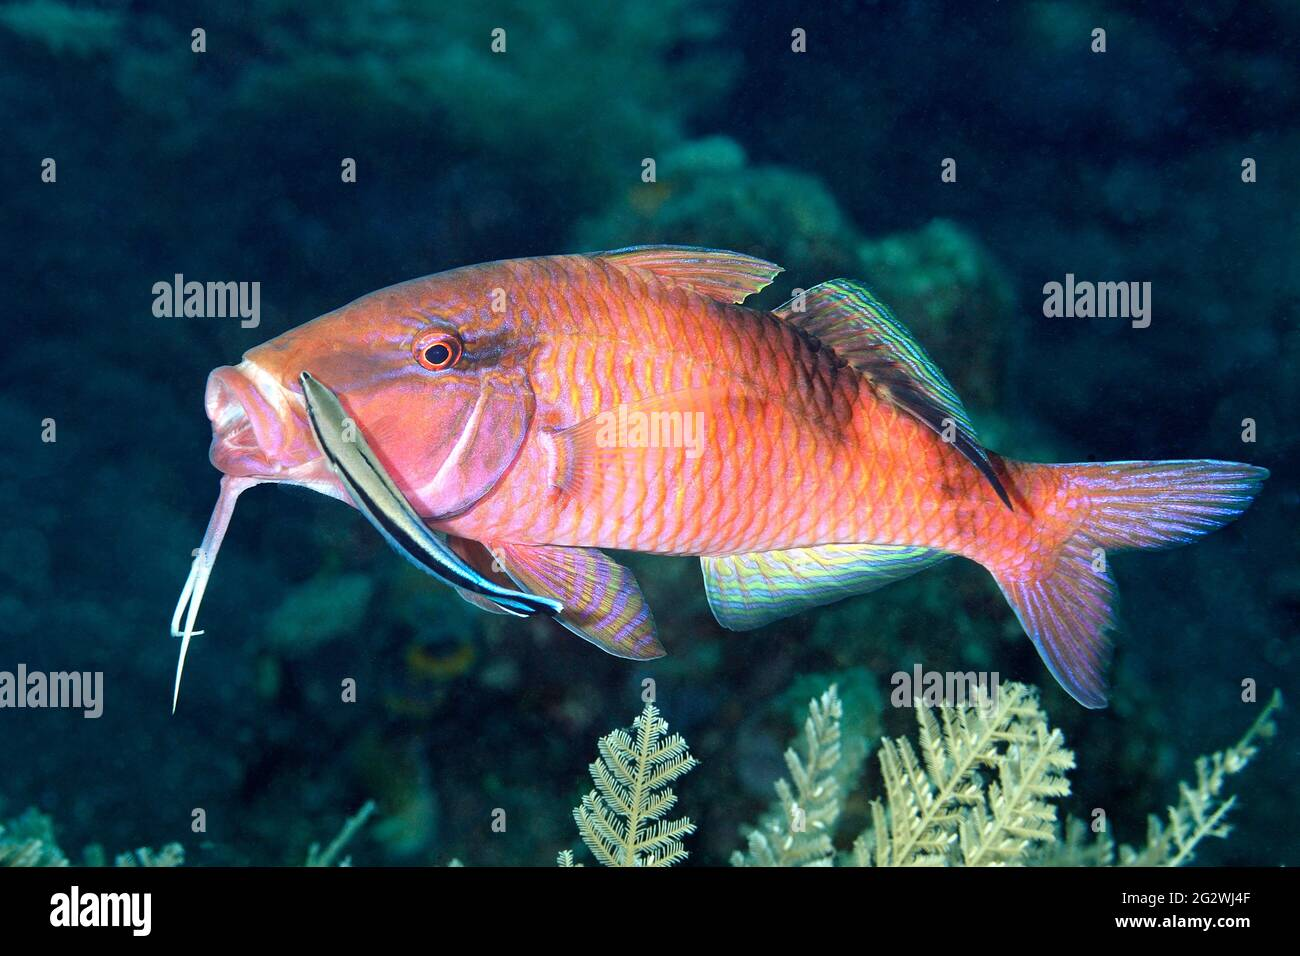 longbarbel-goatfish-parupeneus-macronemus-being-cleaned-by-a-blue-streak-cleaner-wrasse-labroides-dimidiatus-tulamben-bali-indonesia-2G2WJ4F.jpg